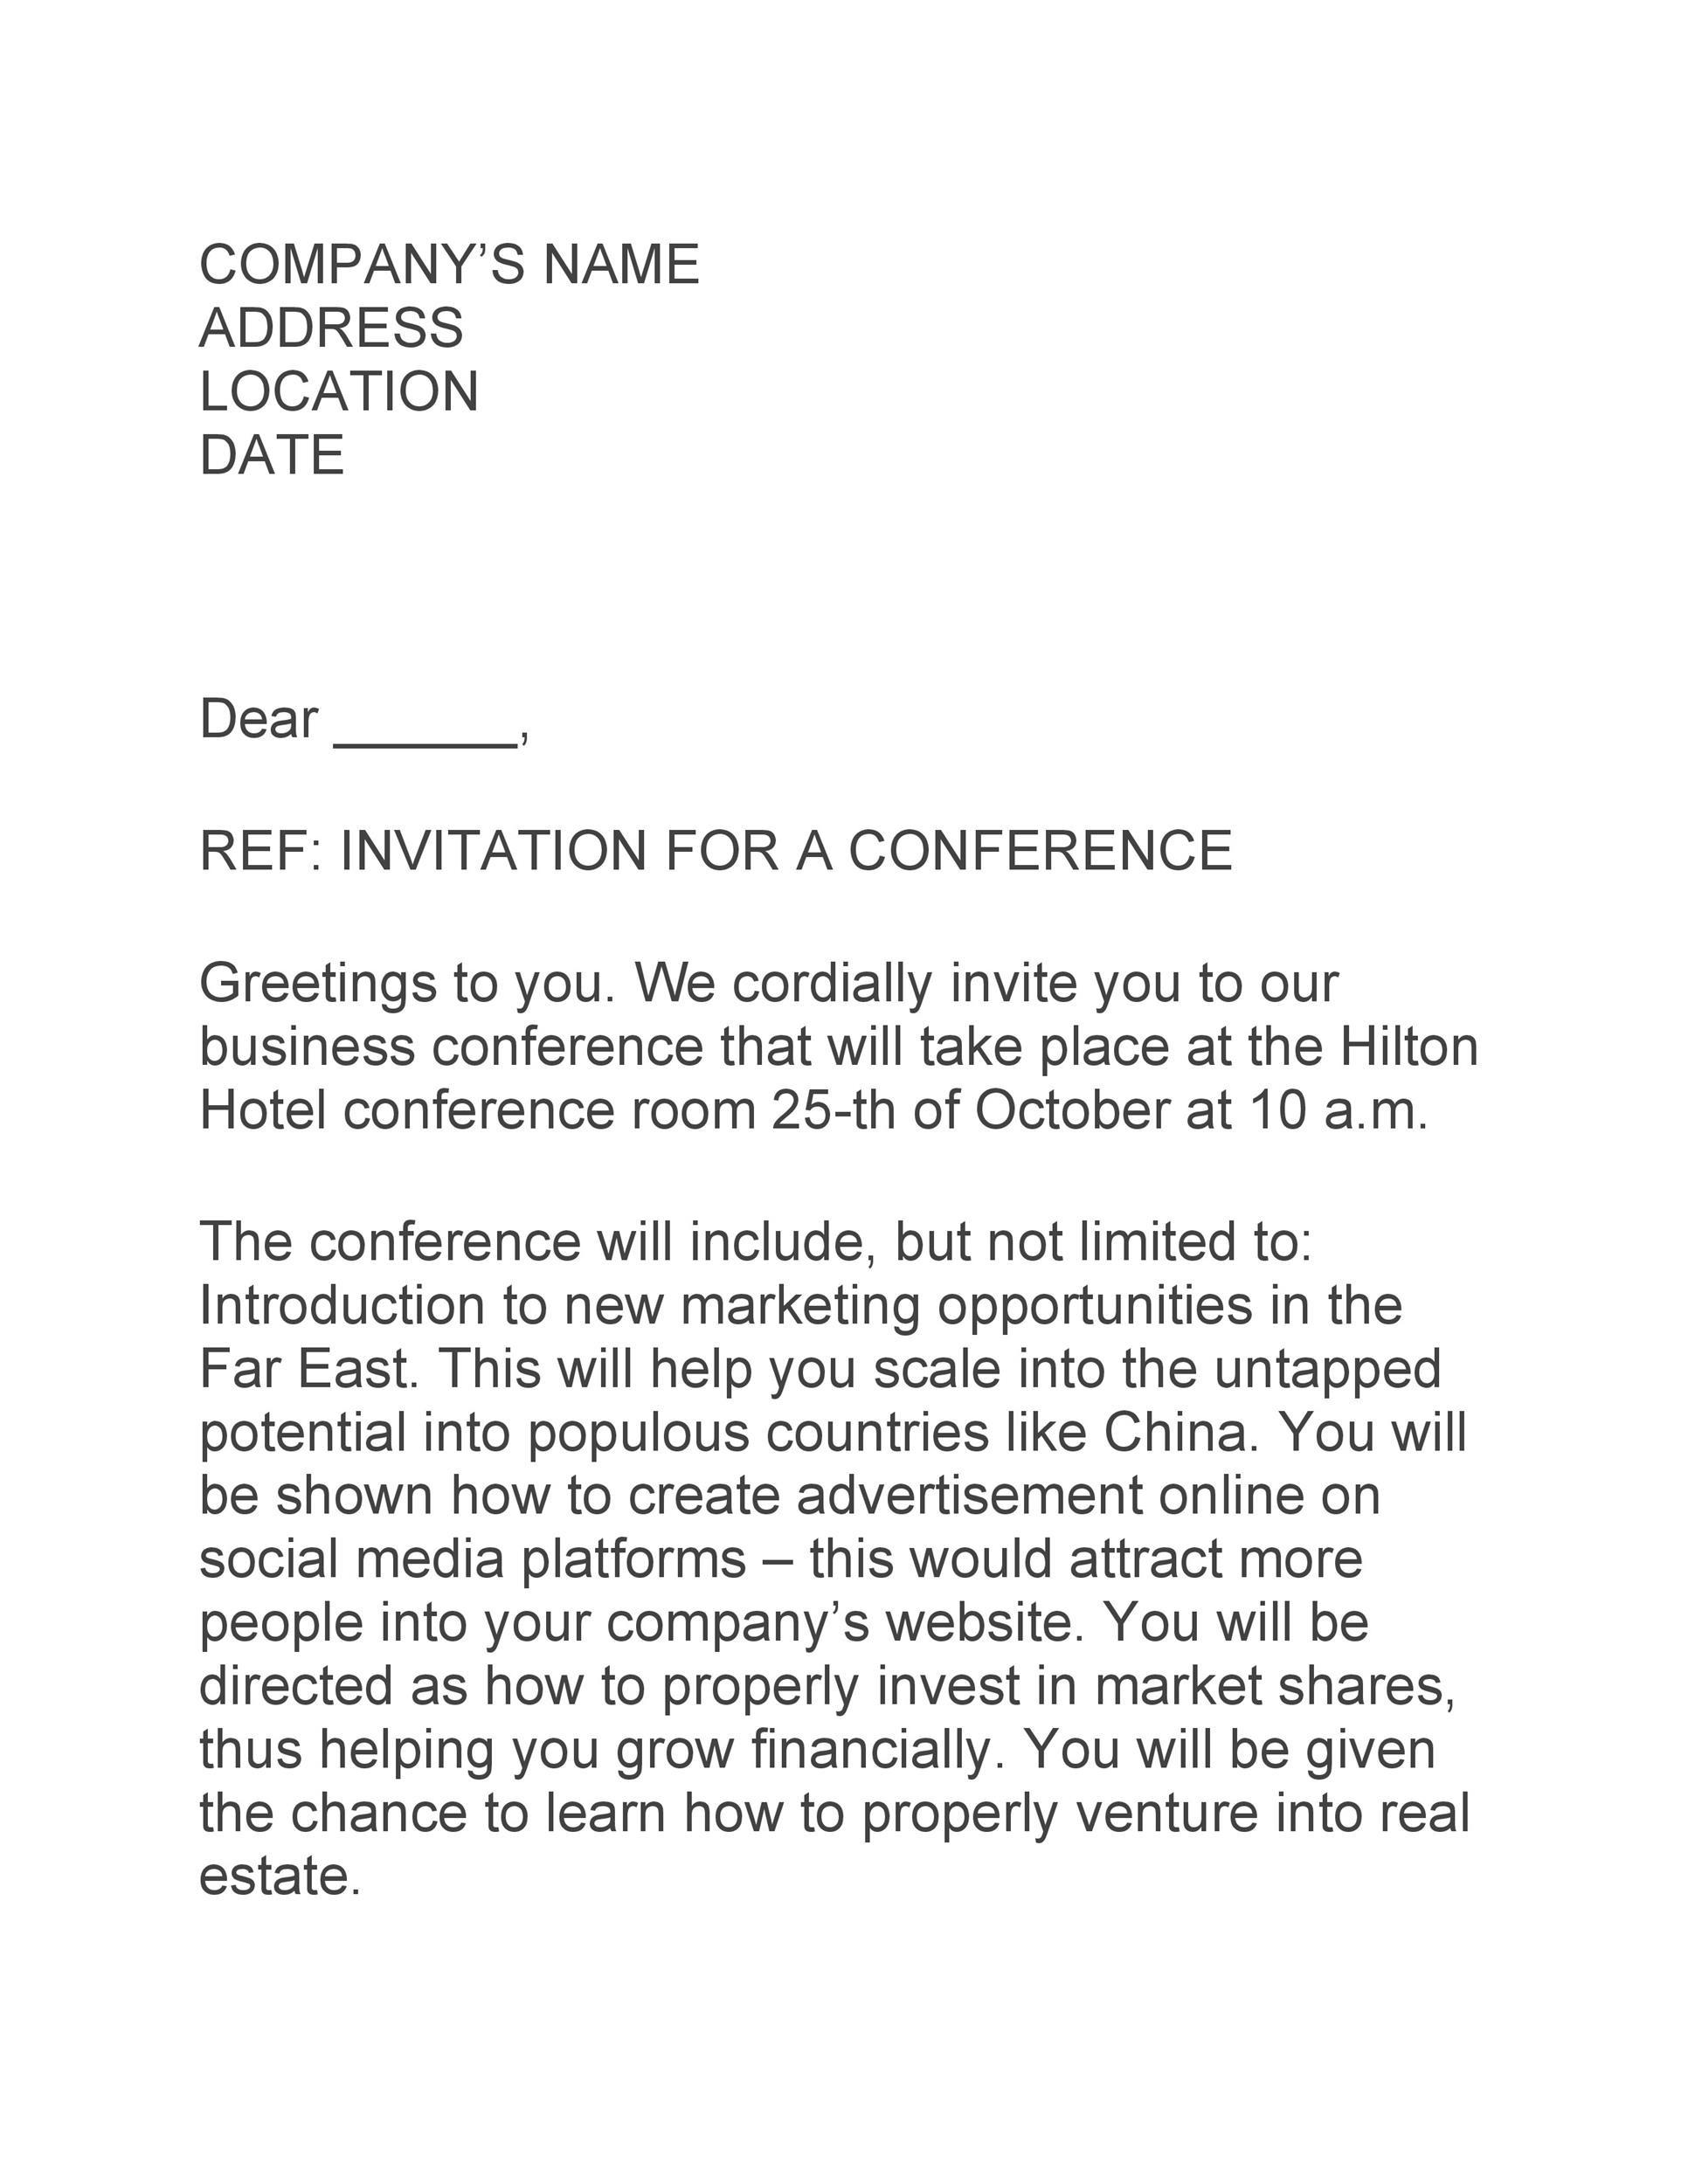 Free invitation letter 50